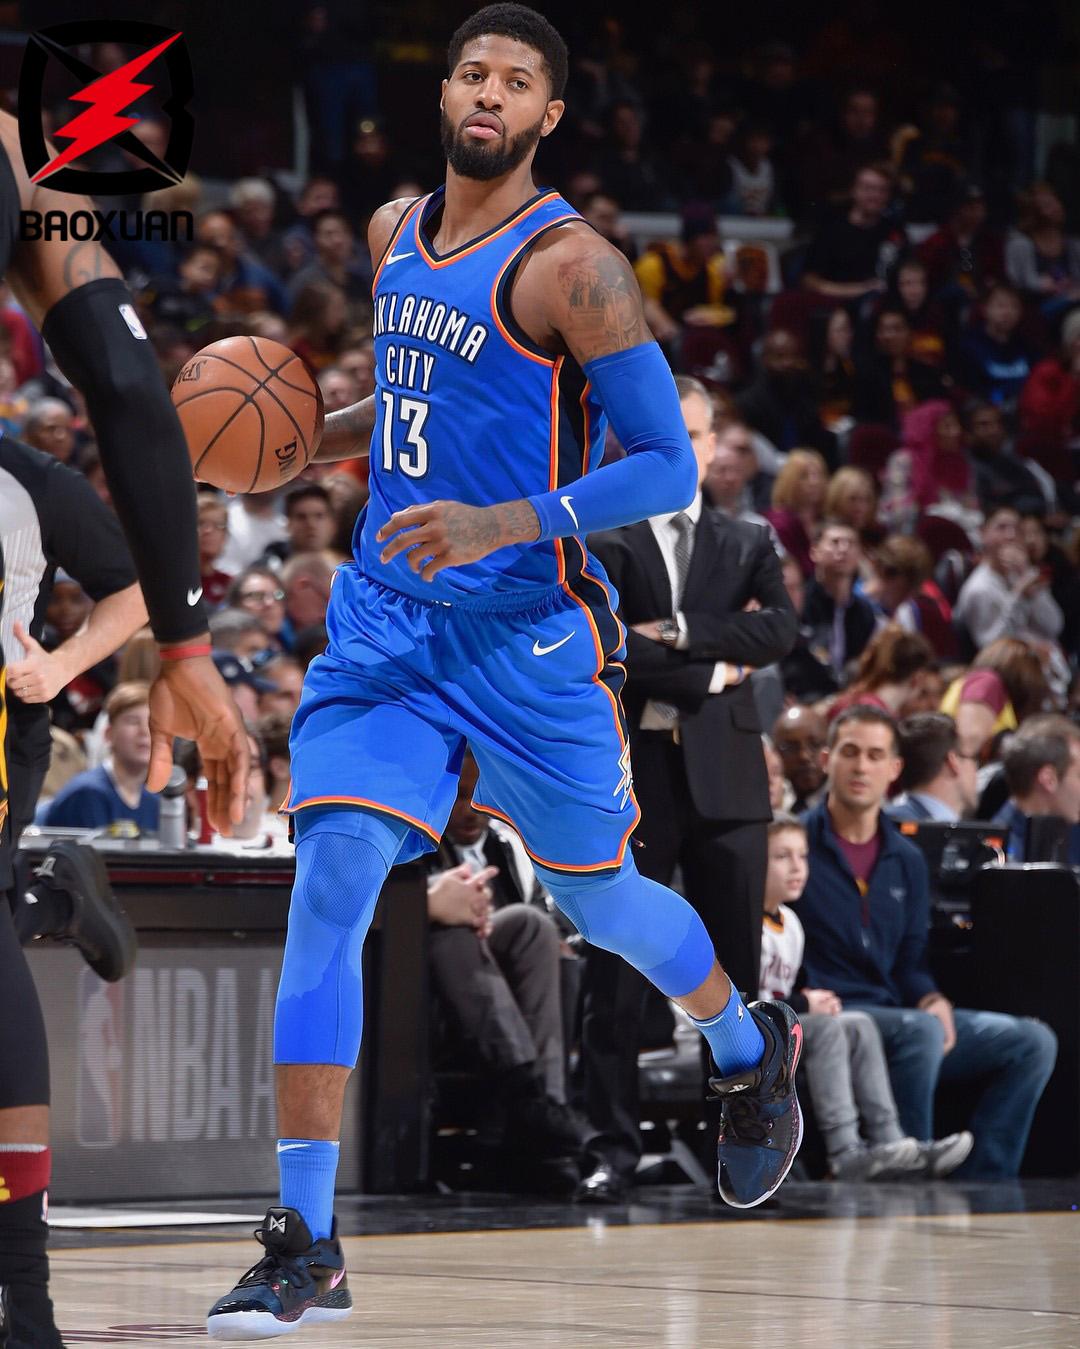 Nike PG 2 亮灯乔治2代泡椒PS 联名款 男子篮球鞋 AT7816-002